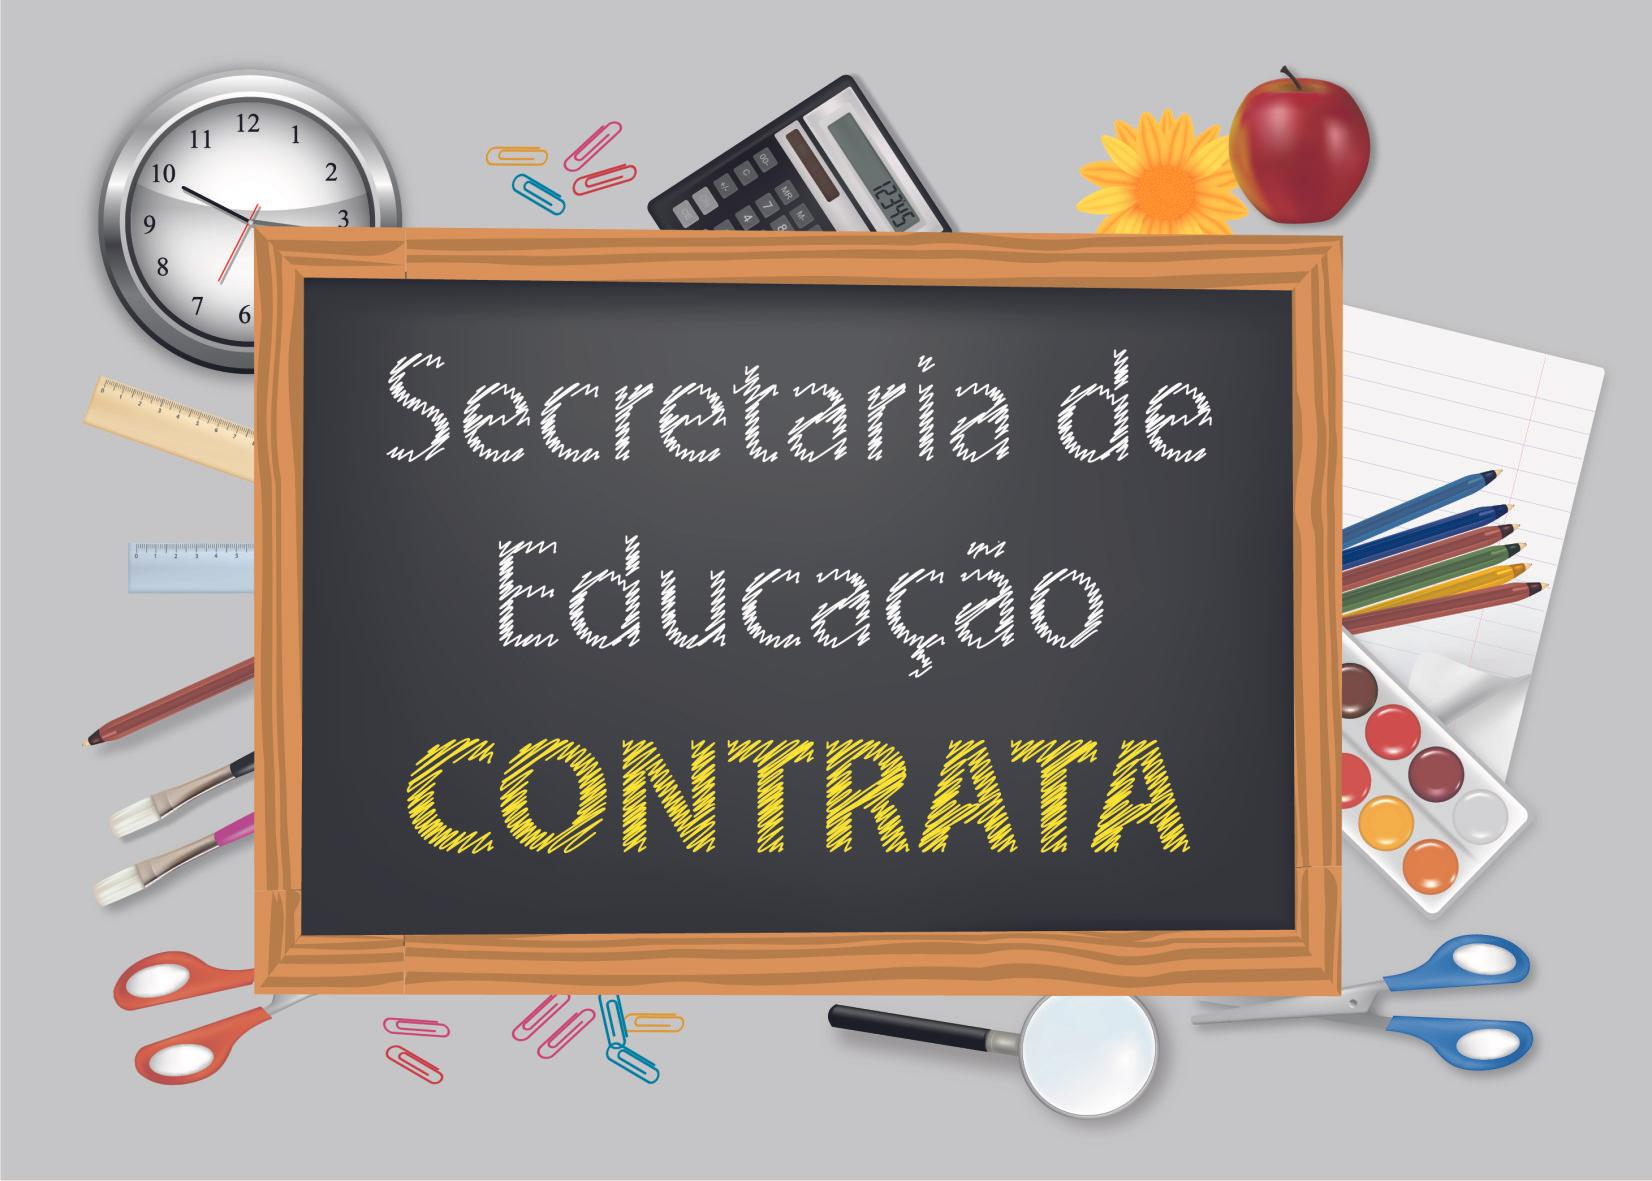 EDUCAÇAO-CONTRATA.jpg